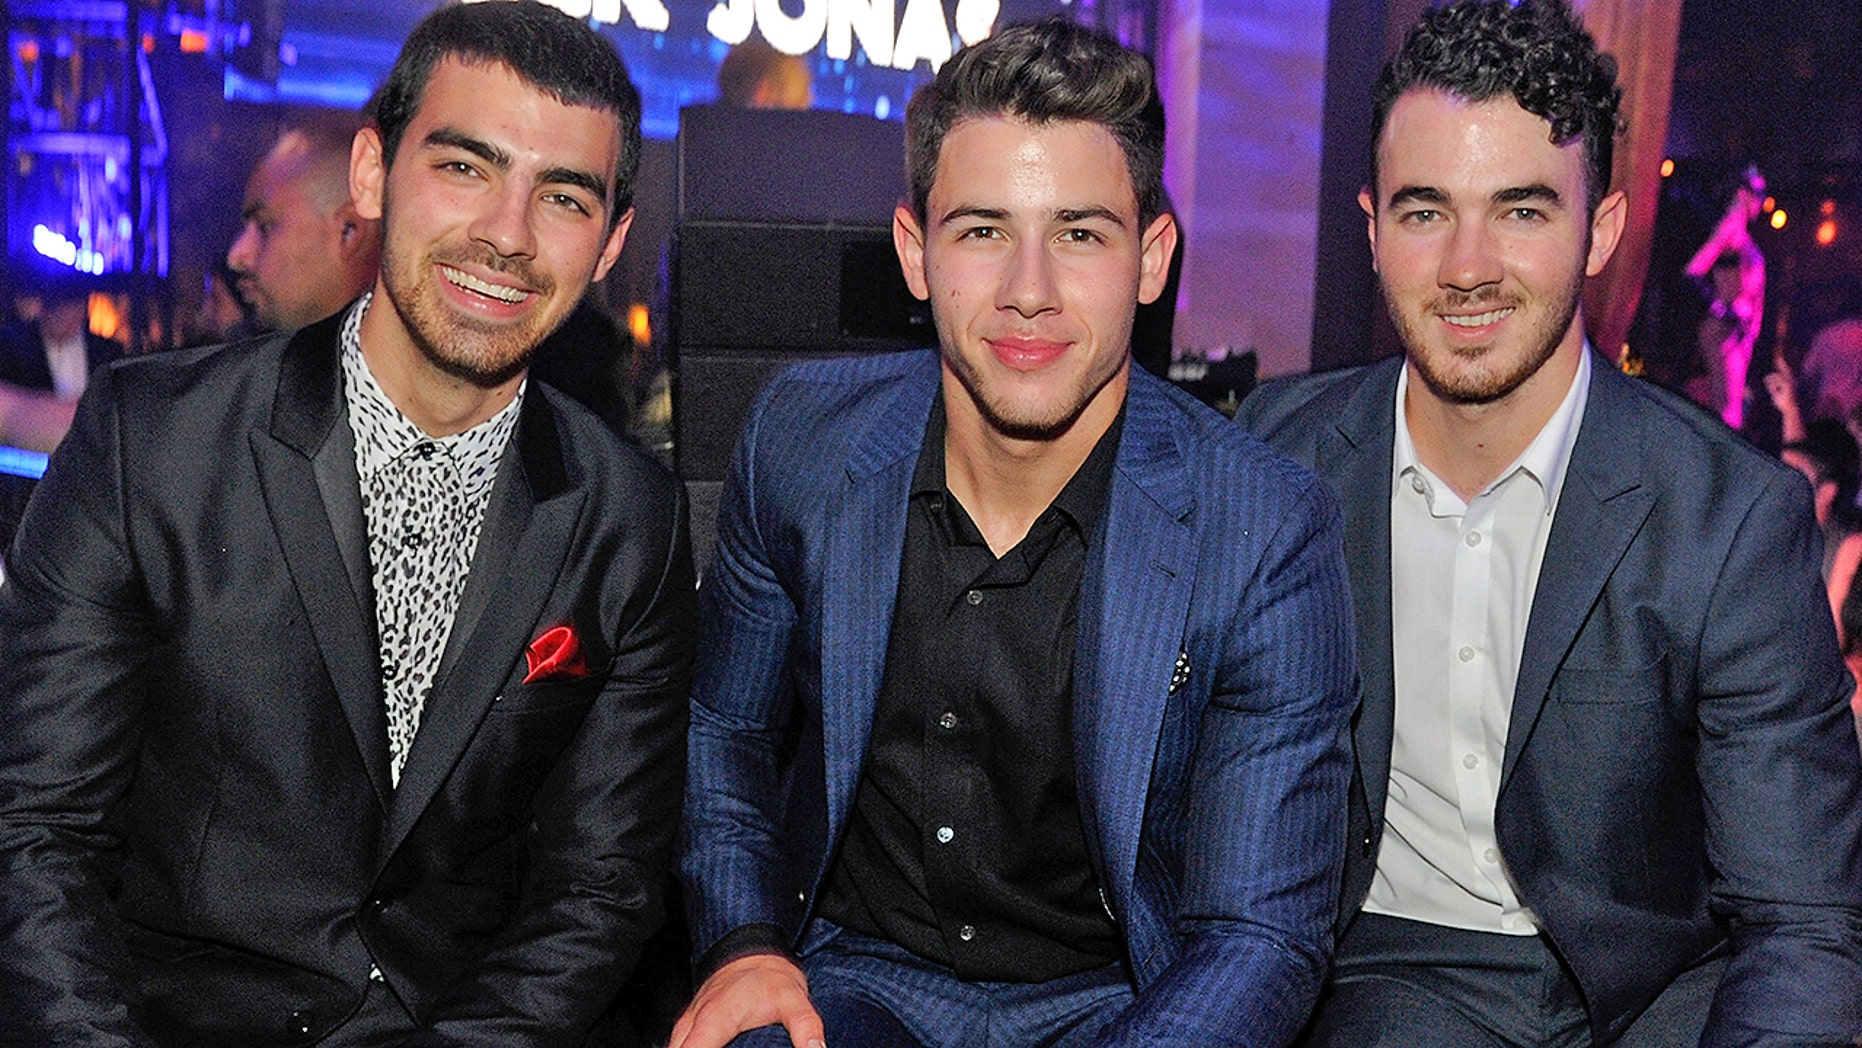 Joe, Nick and Kevin Jonas